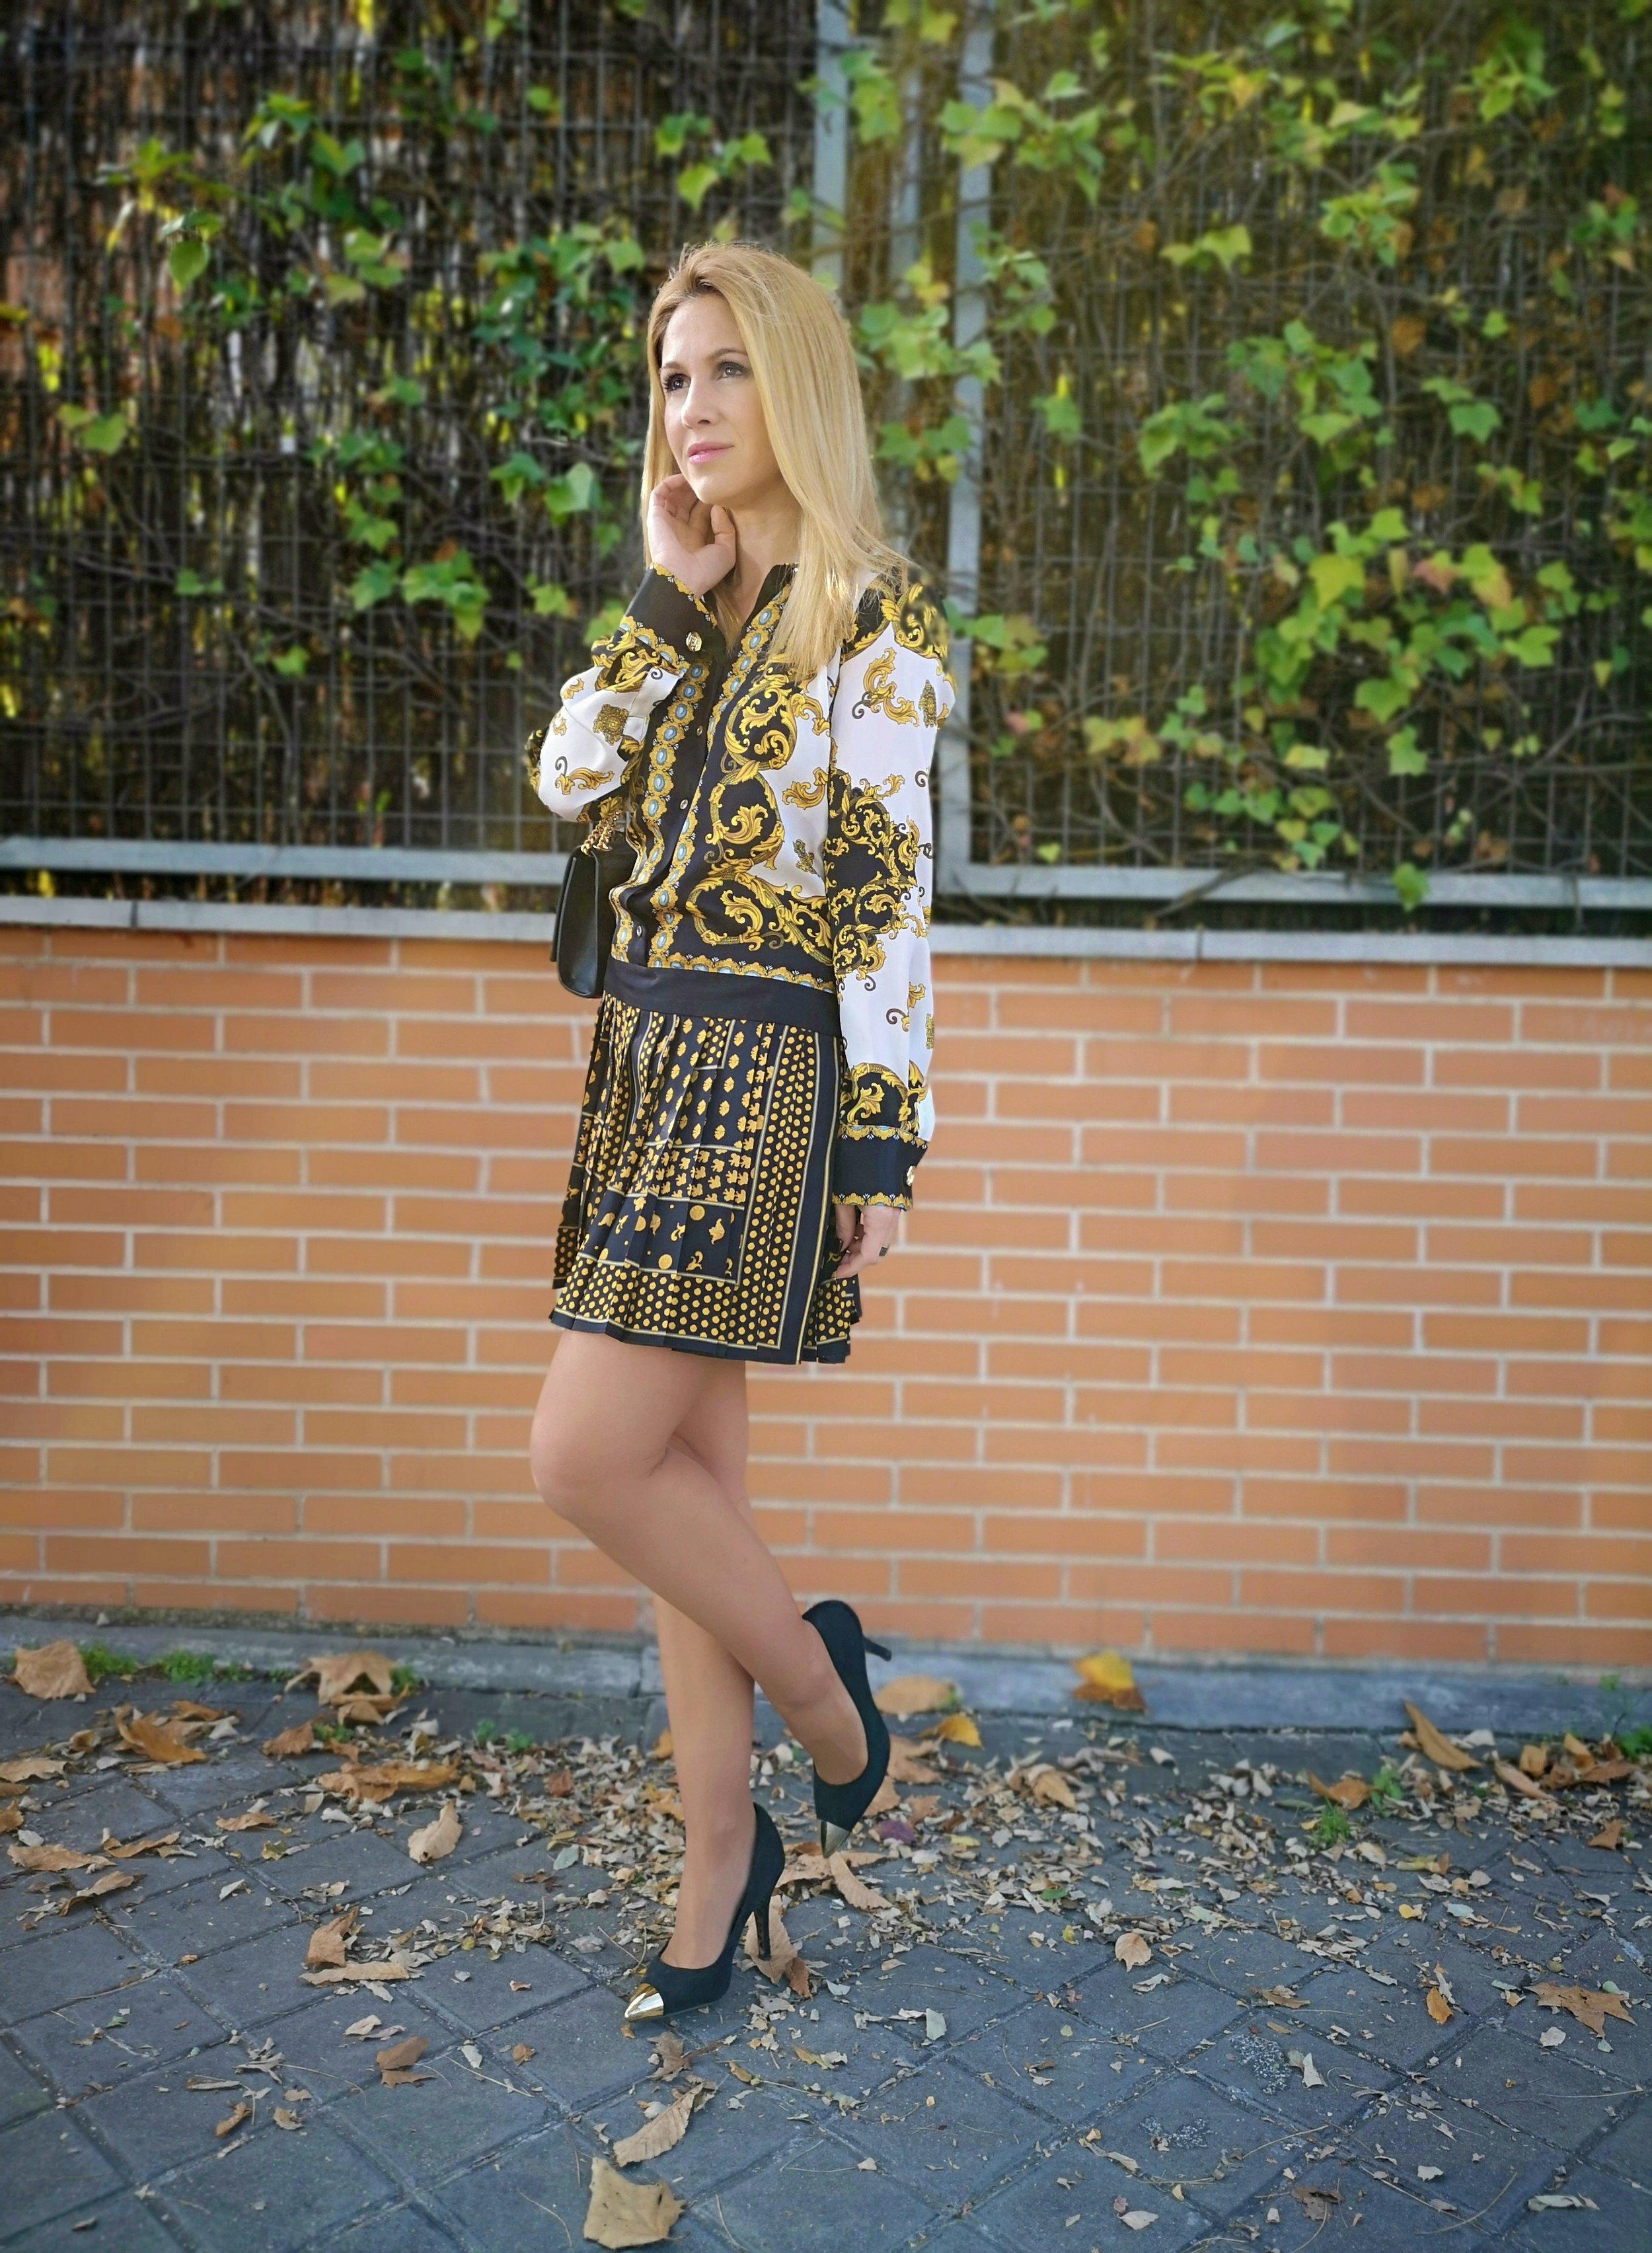 vestido-estilo-versace-zara